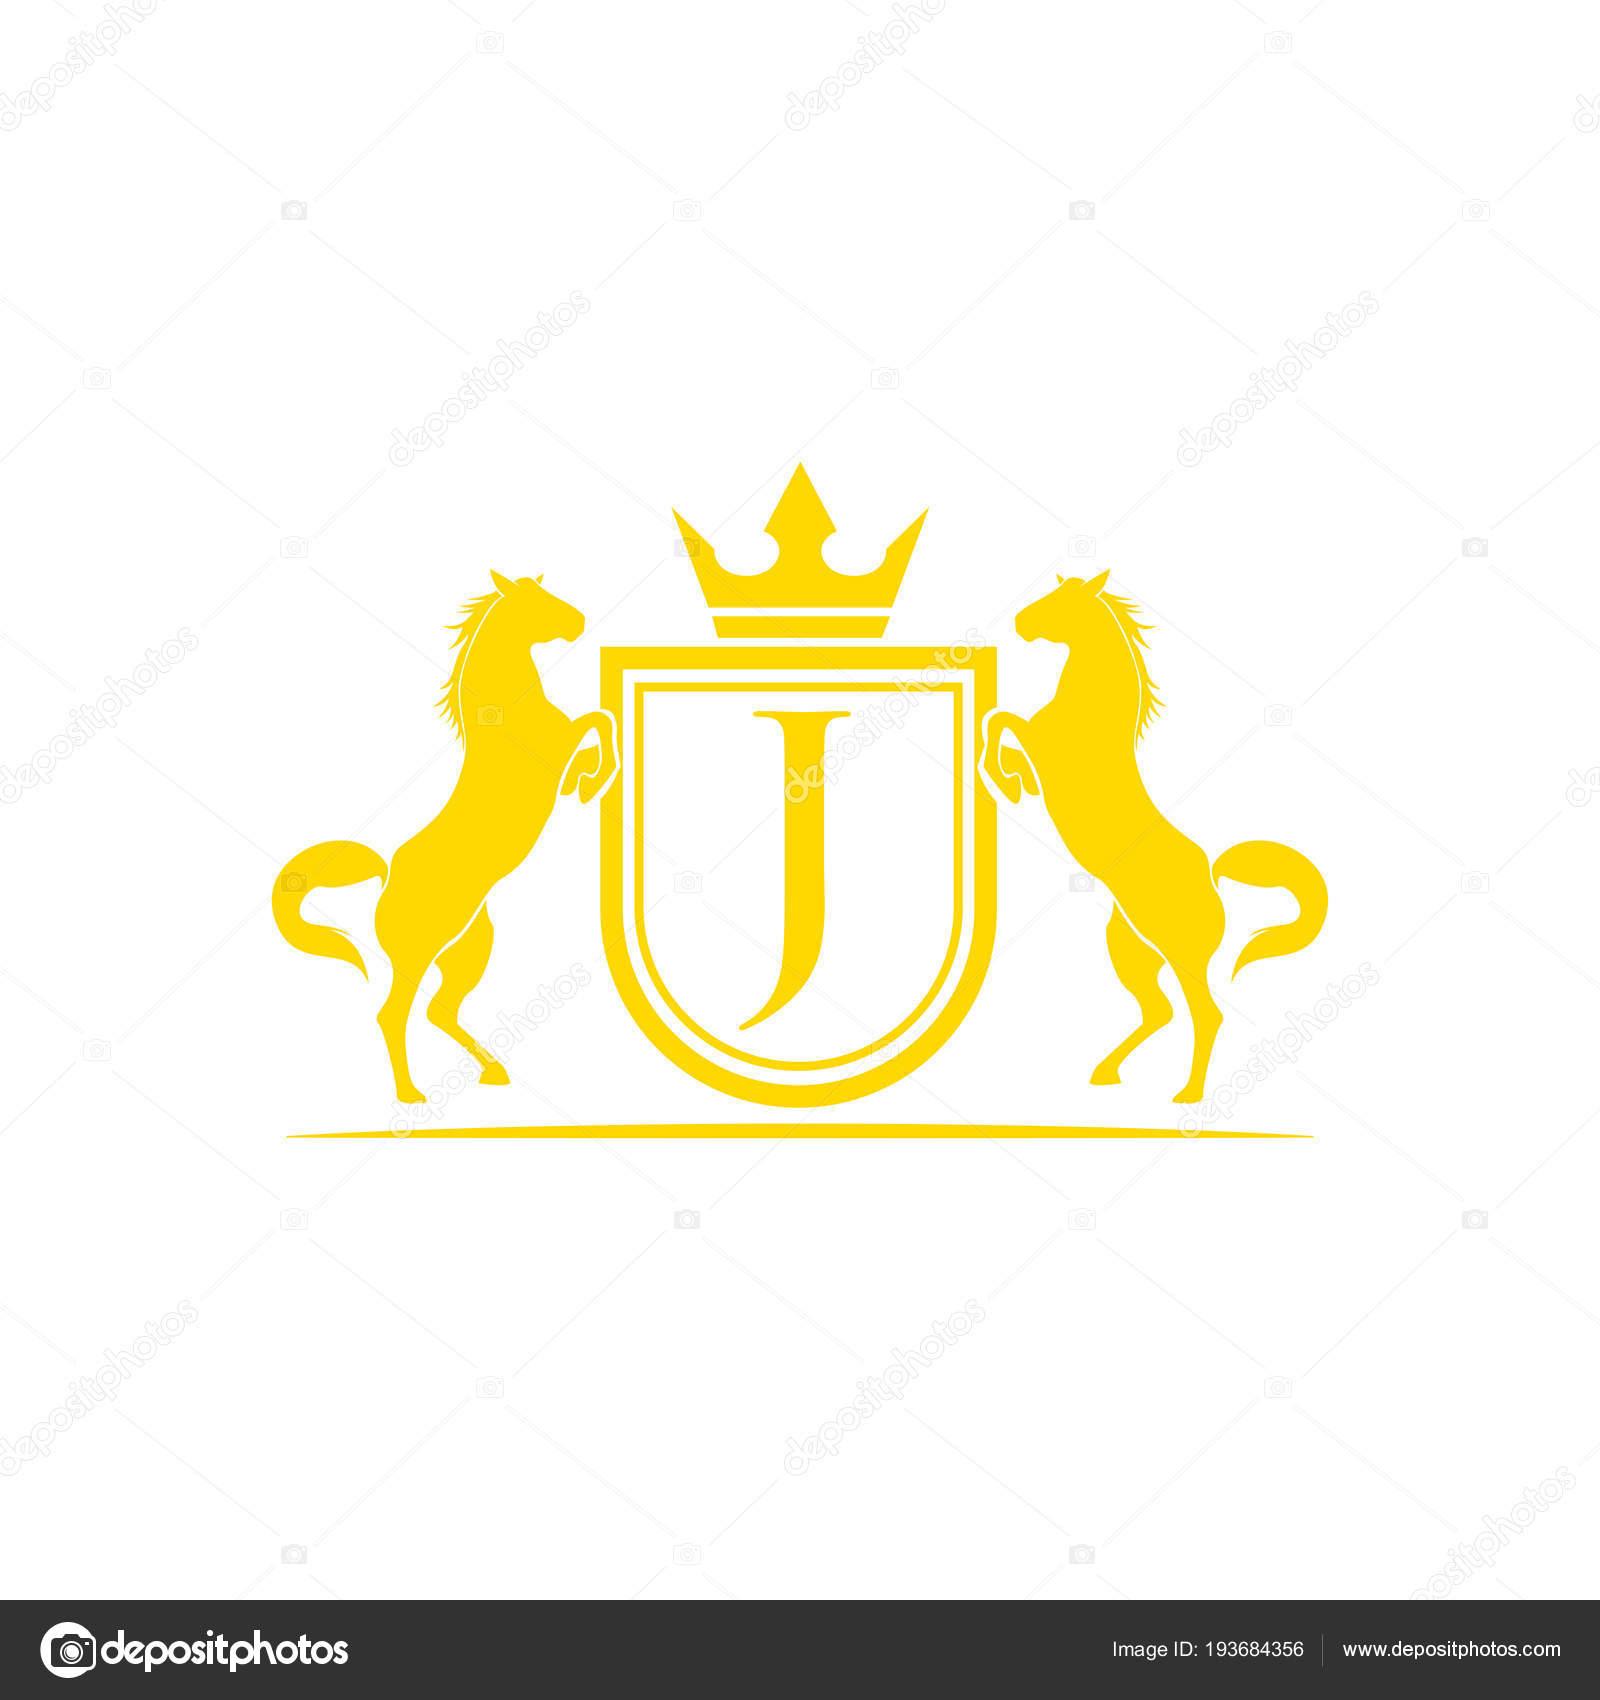 Ranch Brand Logos Initial Letter Logo Horse Brand Logo Design Vector Retro Golden Stock Vector C Alfianiqbal 193684356